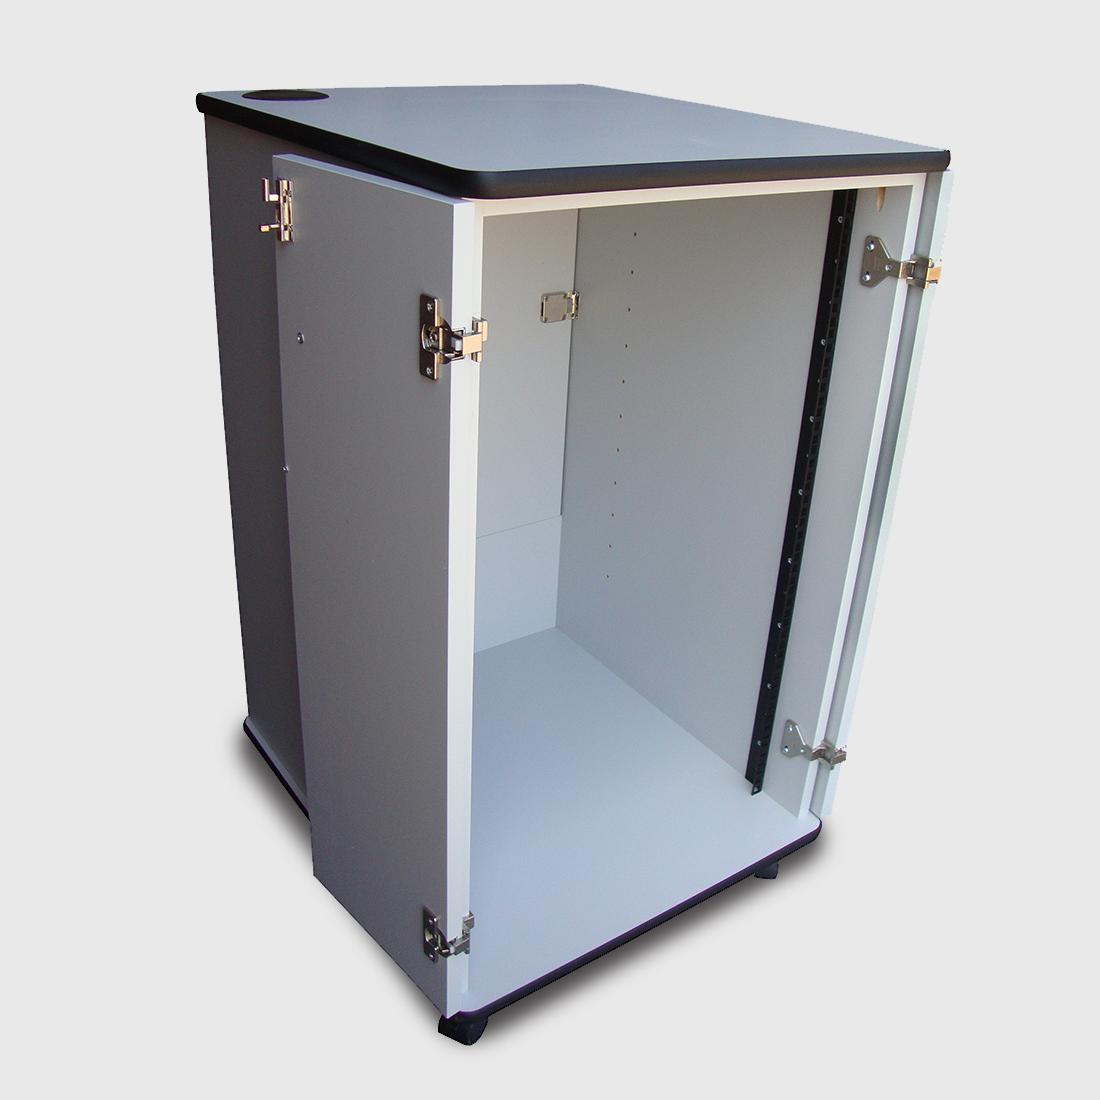 bdi avion espresso wide home dp entertainment com av triple cabinet stained amazon kitchen oak